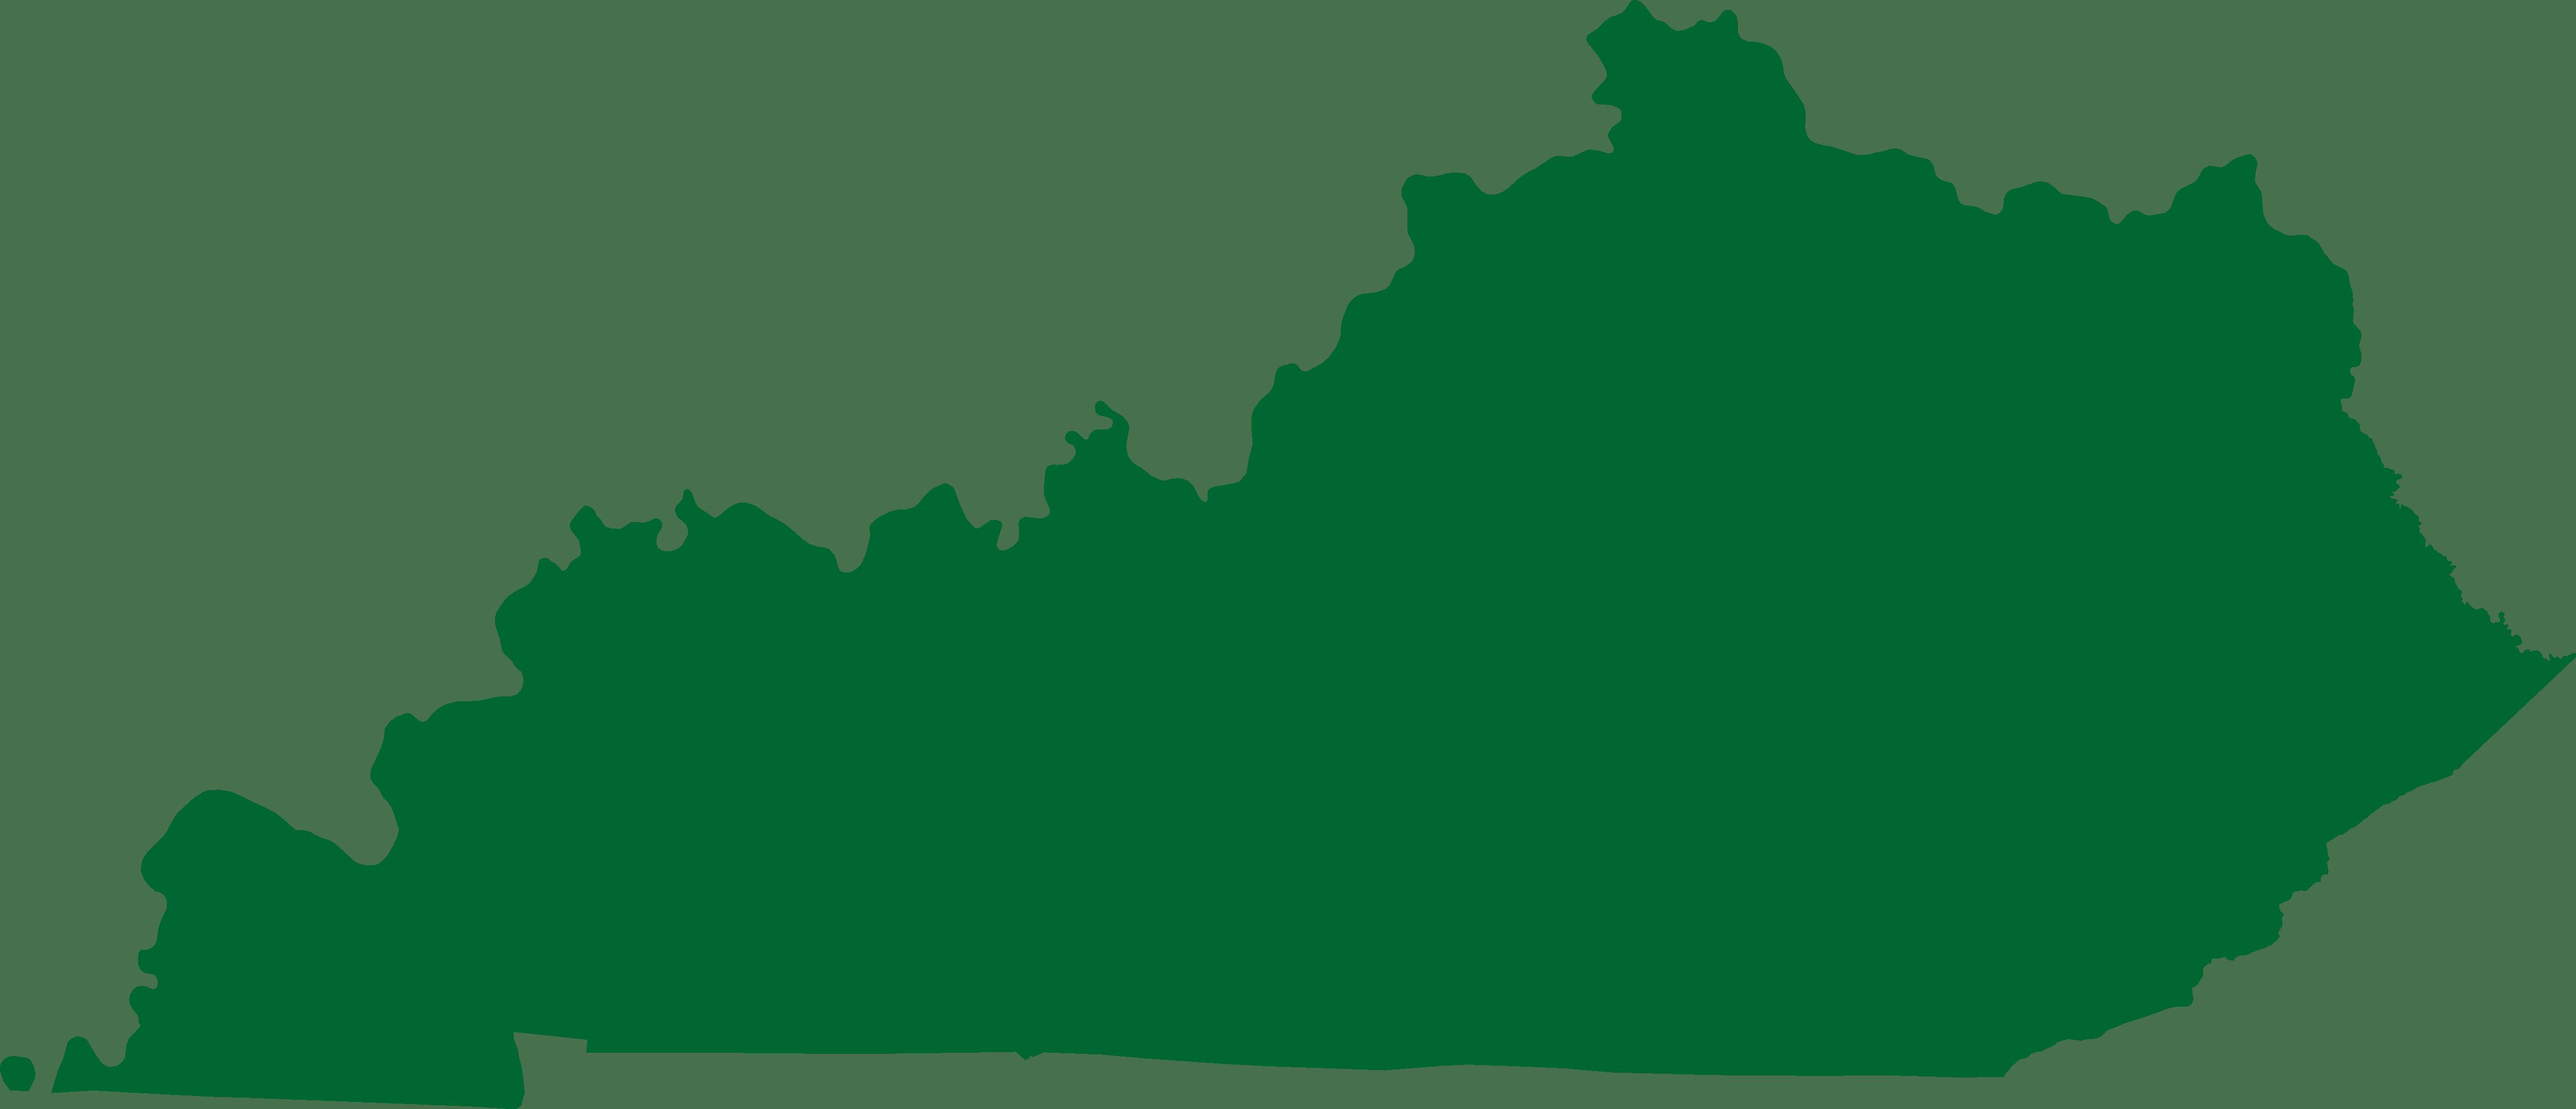 Kentucky mental health